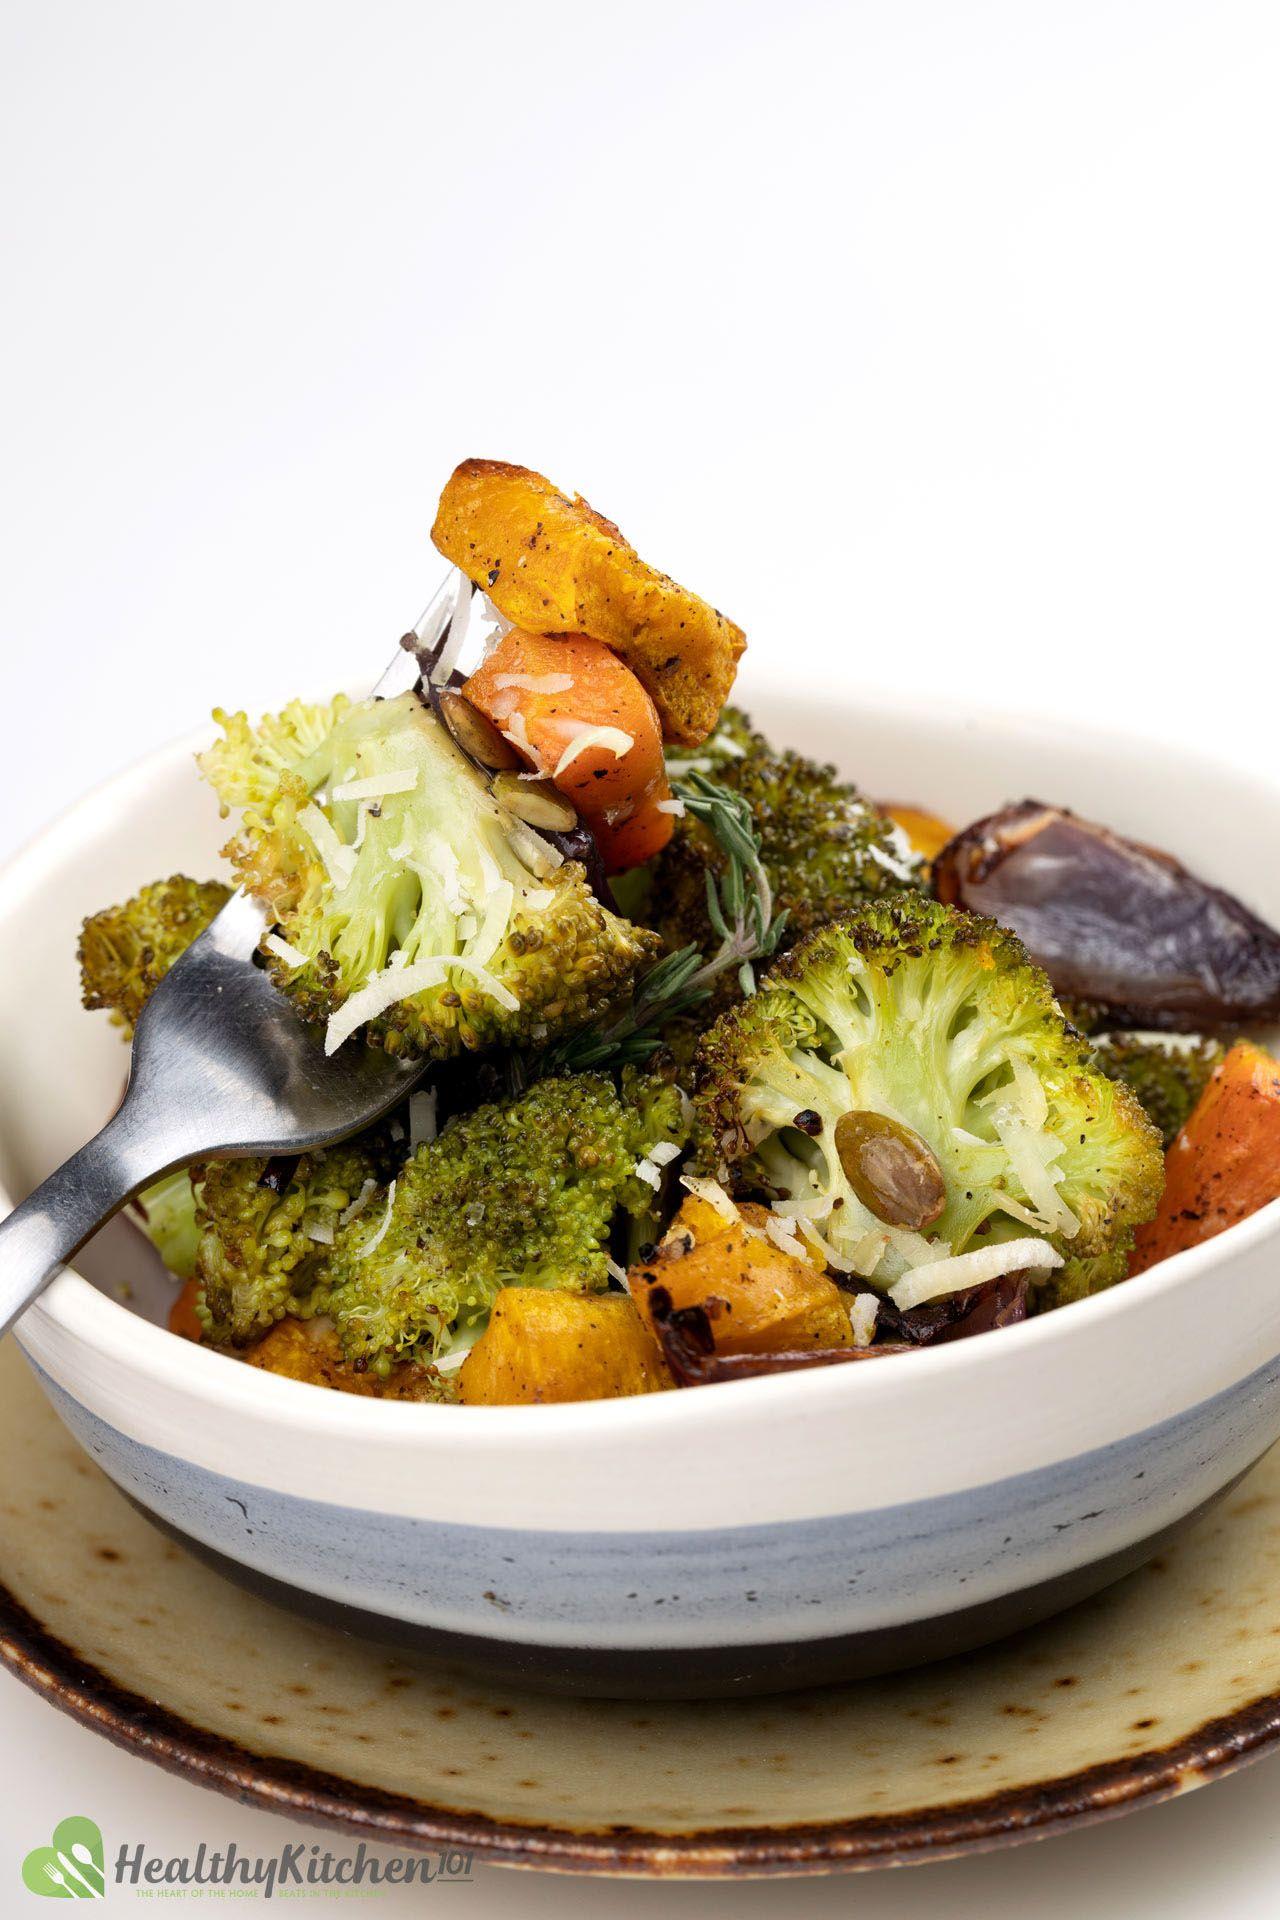 Homemade Roasted Broccoli Recipe